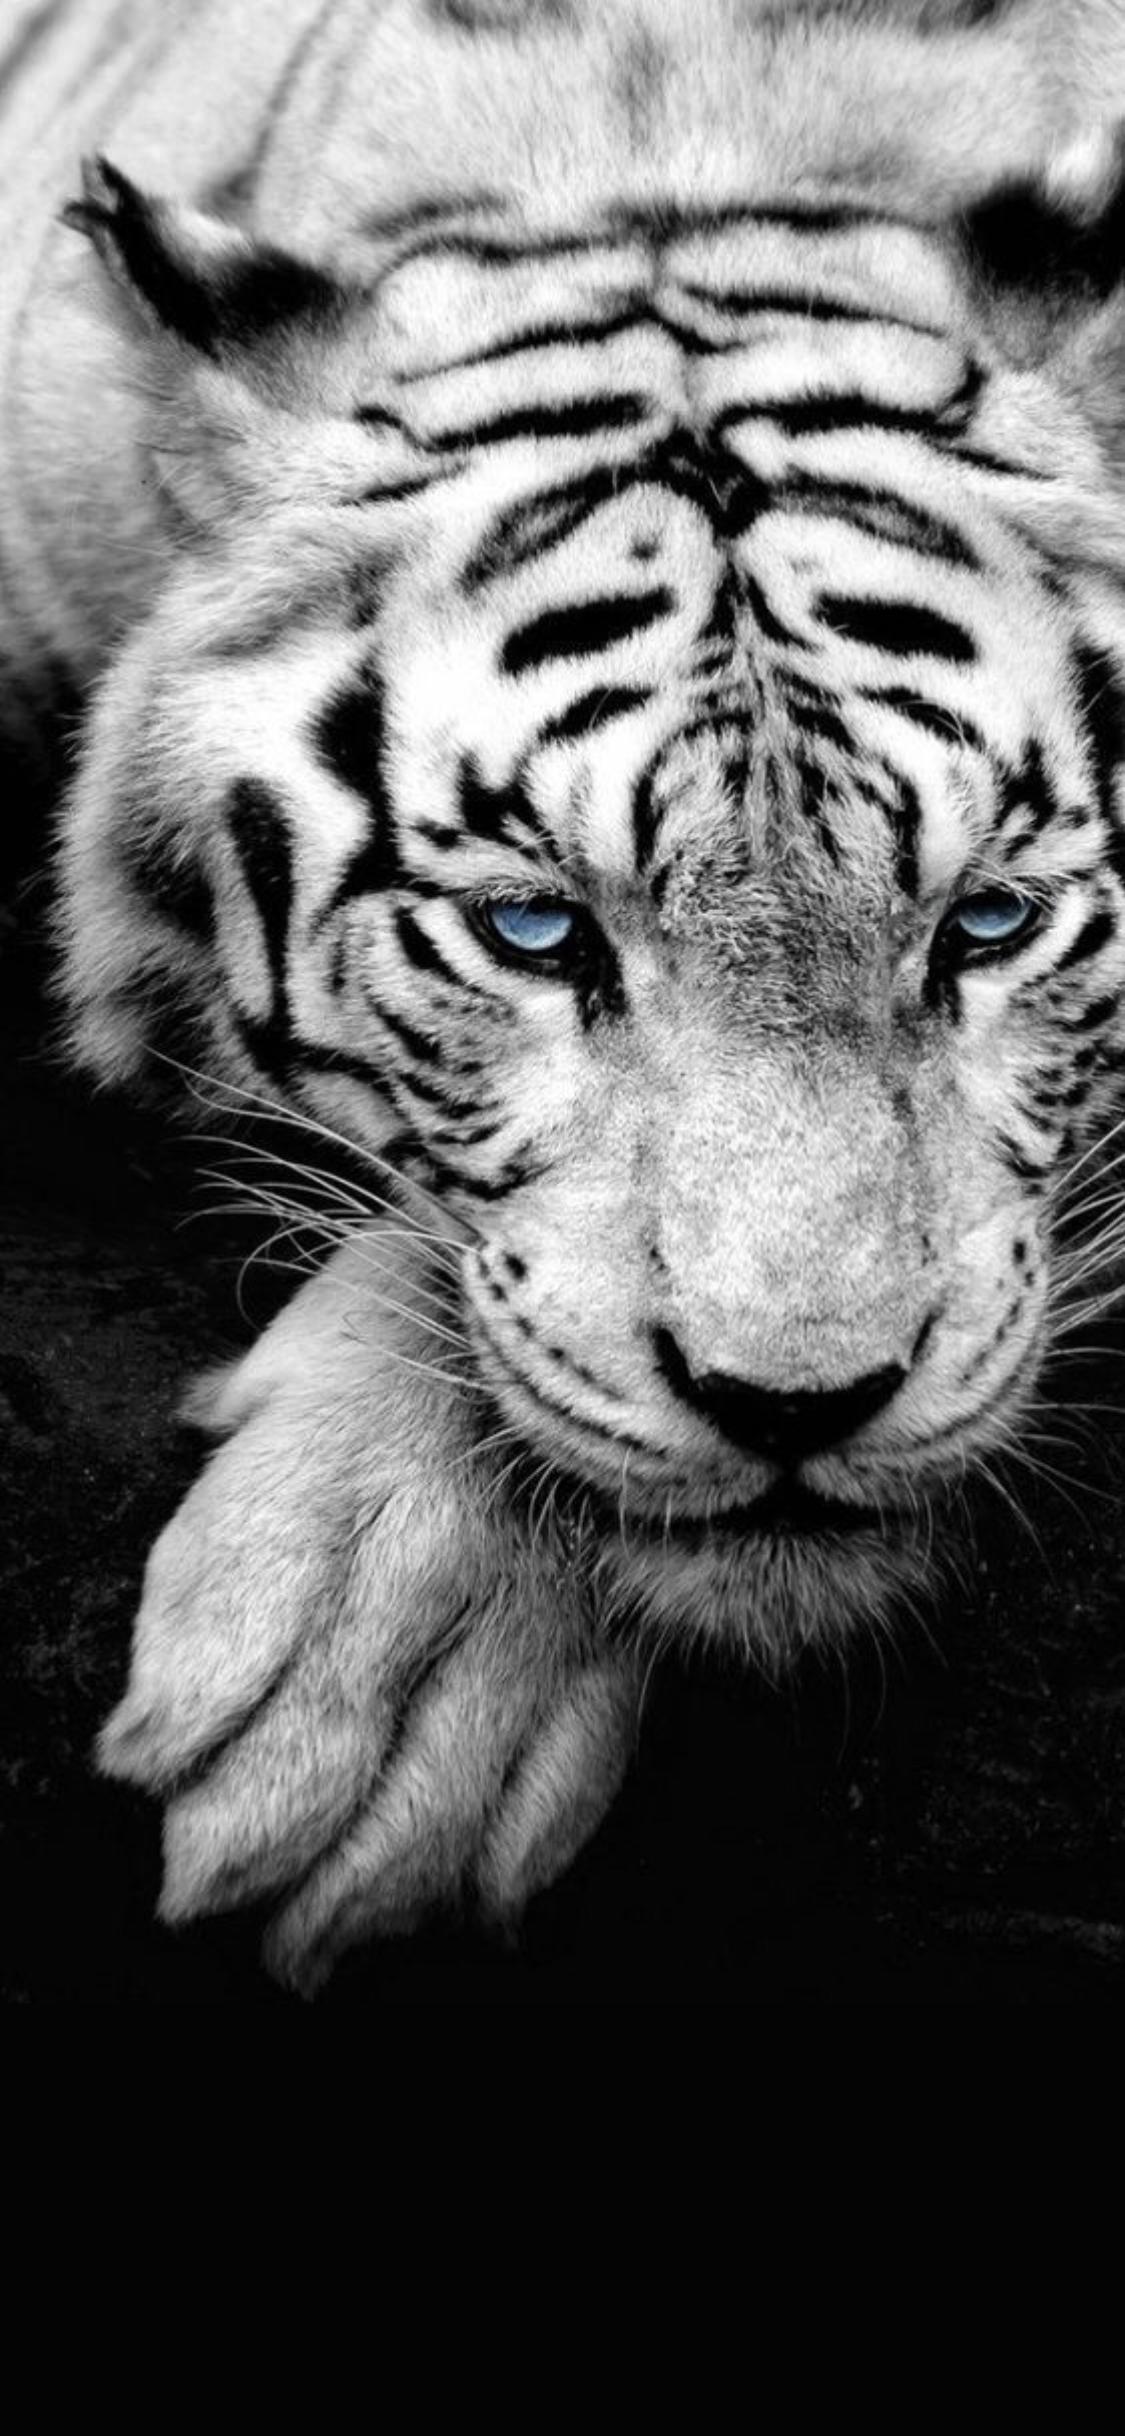 Animals Wallpaper Iphone Hd Wallpaper Wild Animal Wallpaper Animals Wild Pet Tiger